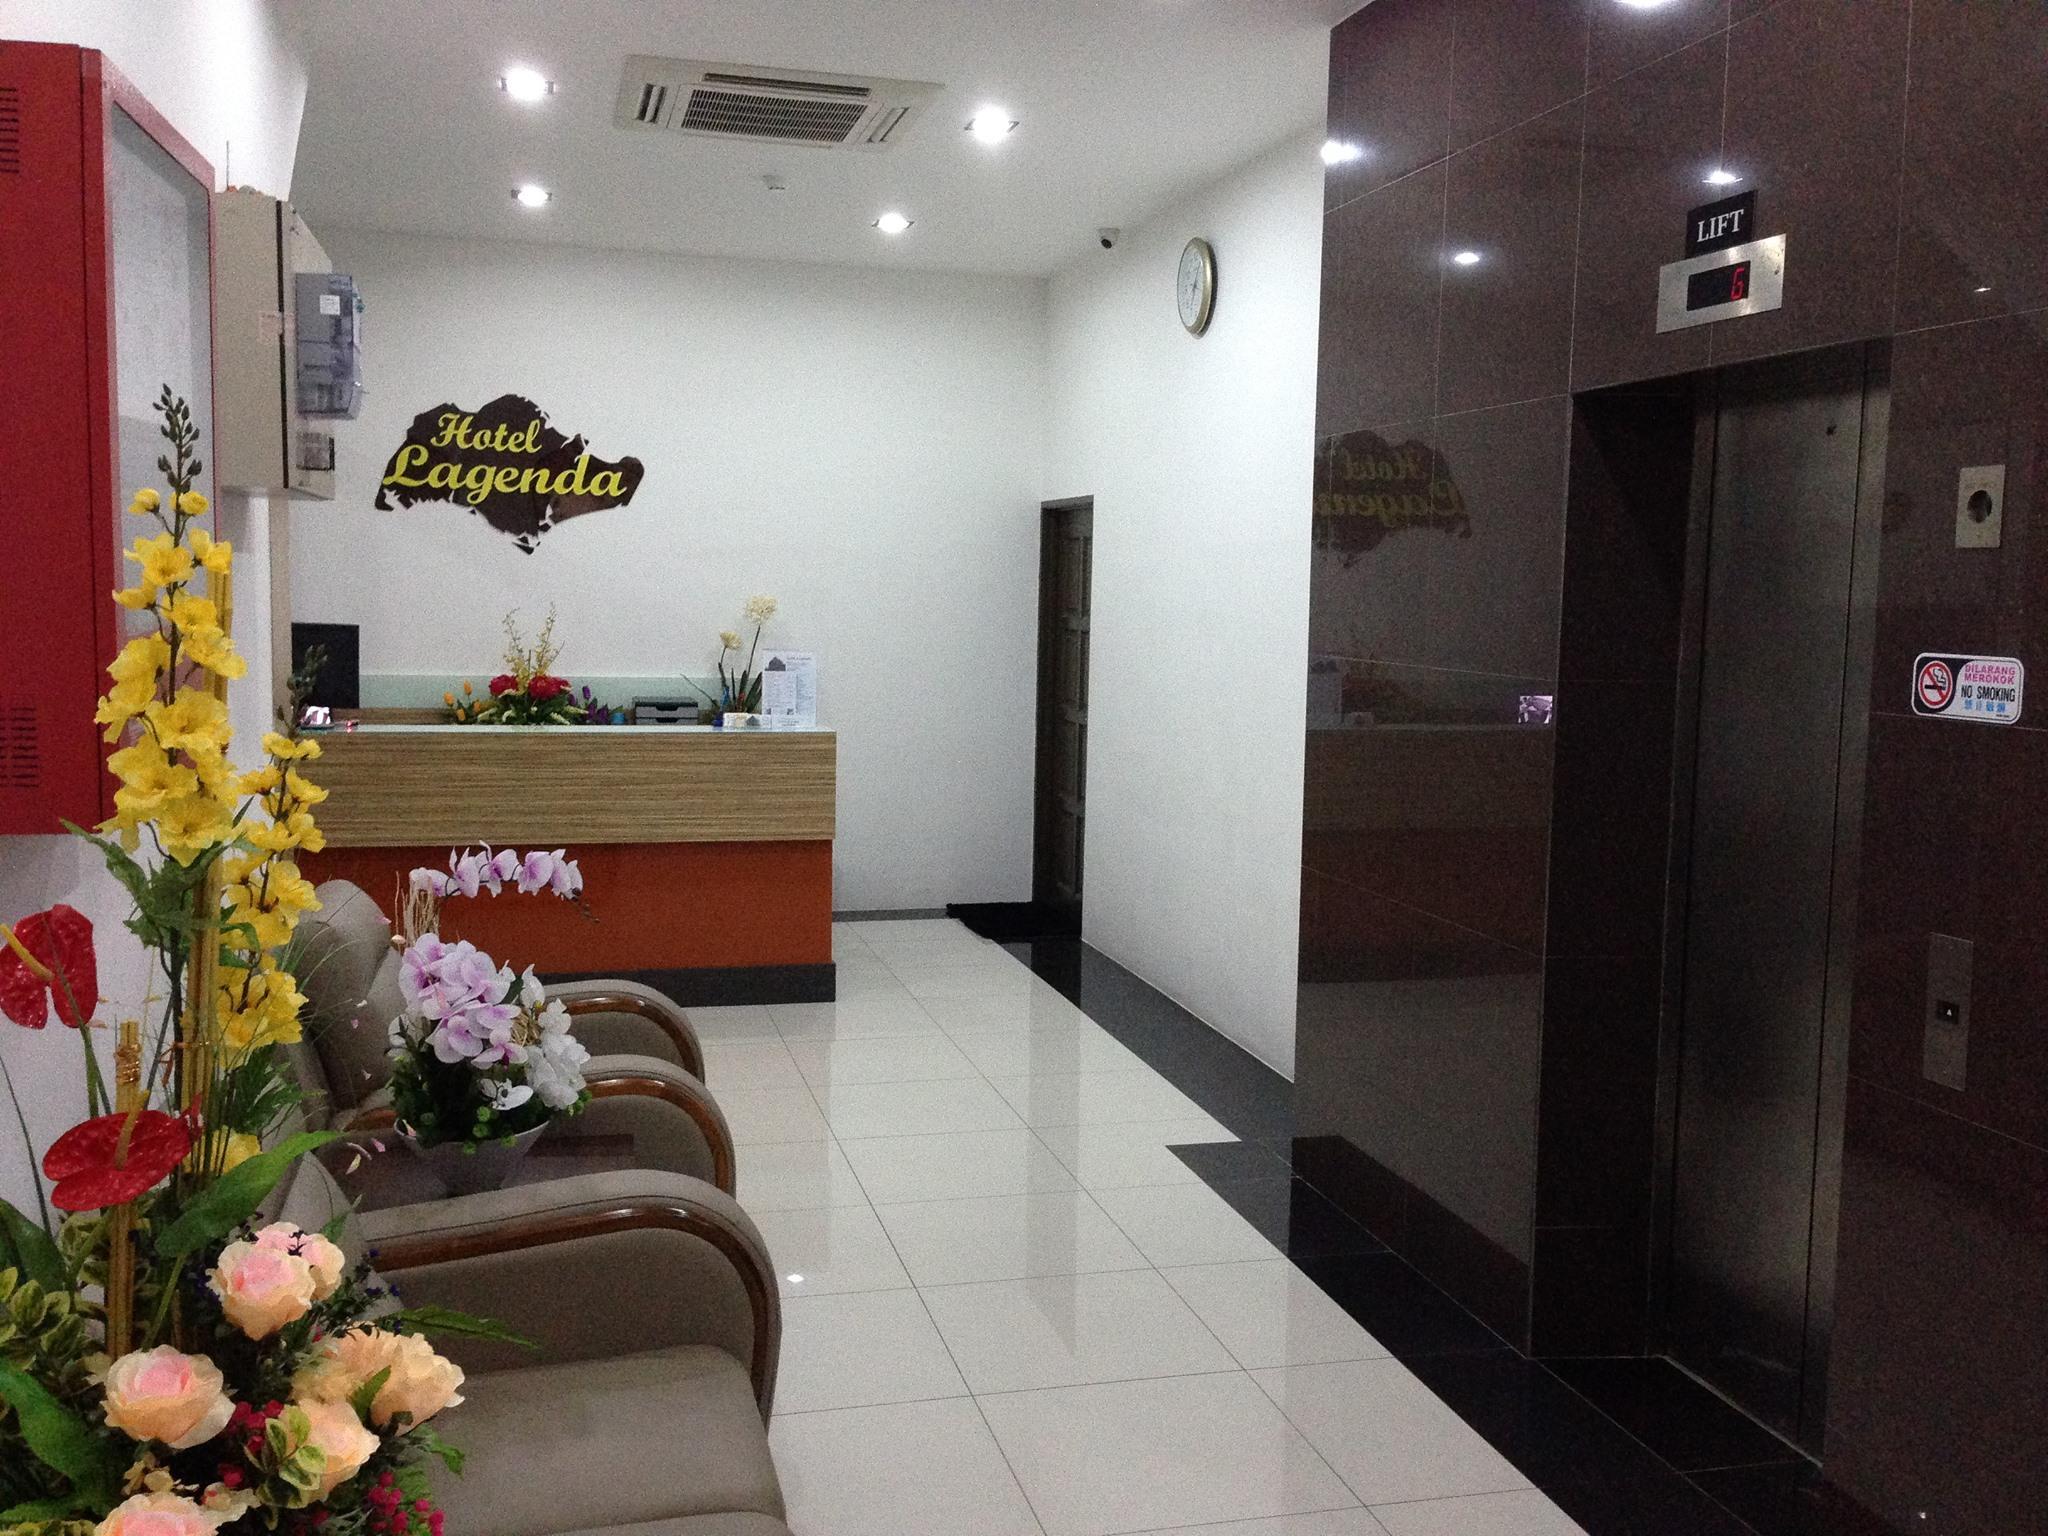 Hotel Lagenda, Hilir Perak